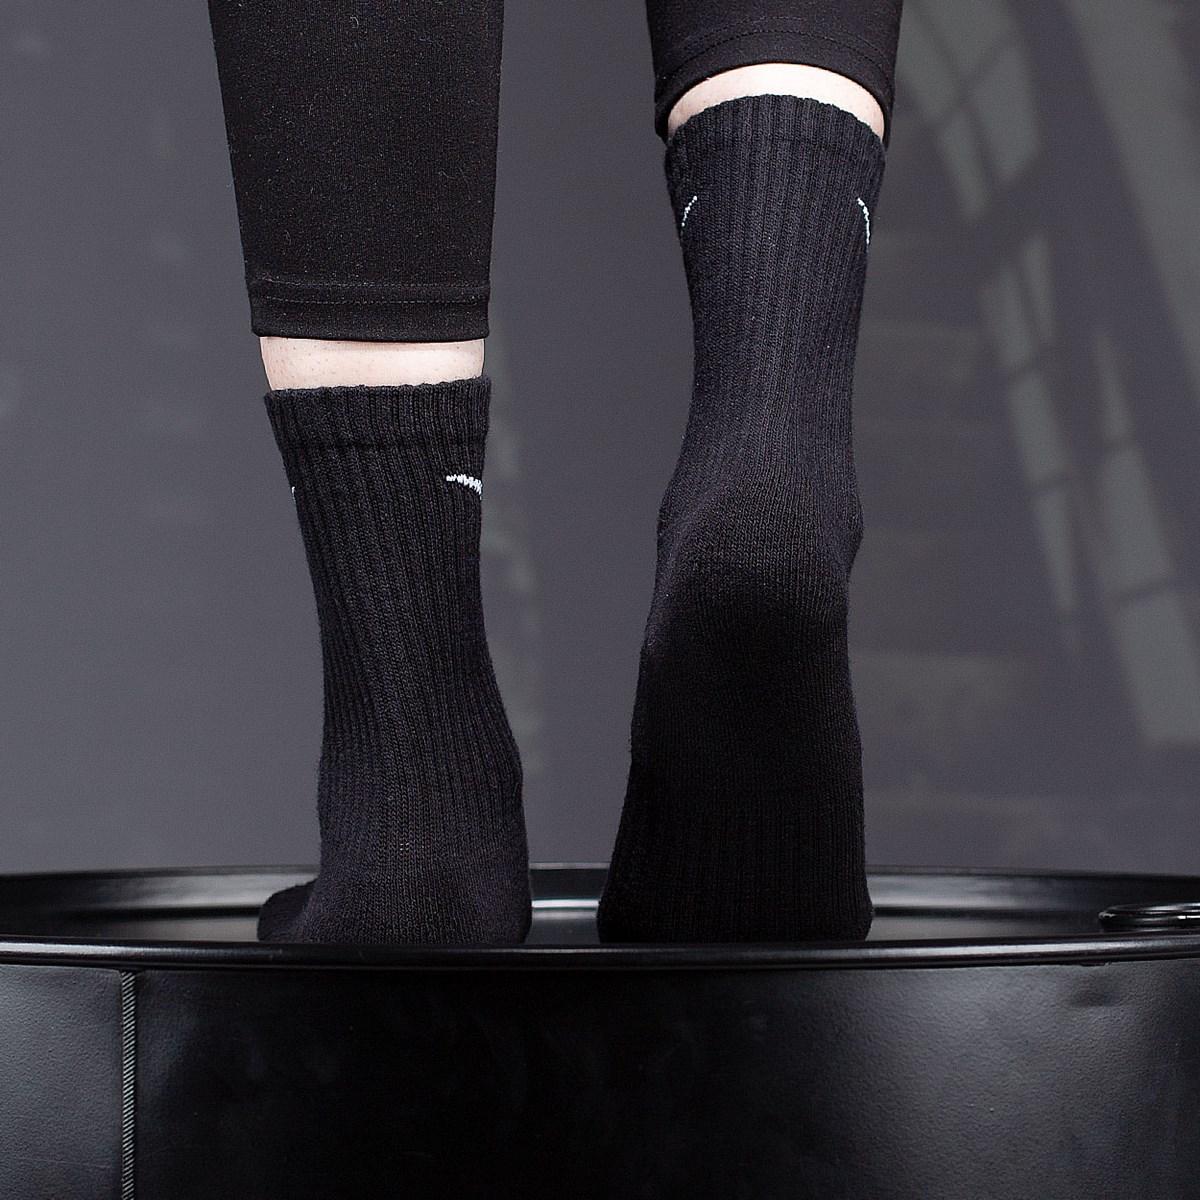 Meia Nike Unissex Everyday Cotton Cushioned Crew Kit 6 Pares Black SX7666-010